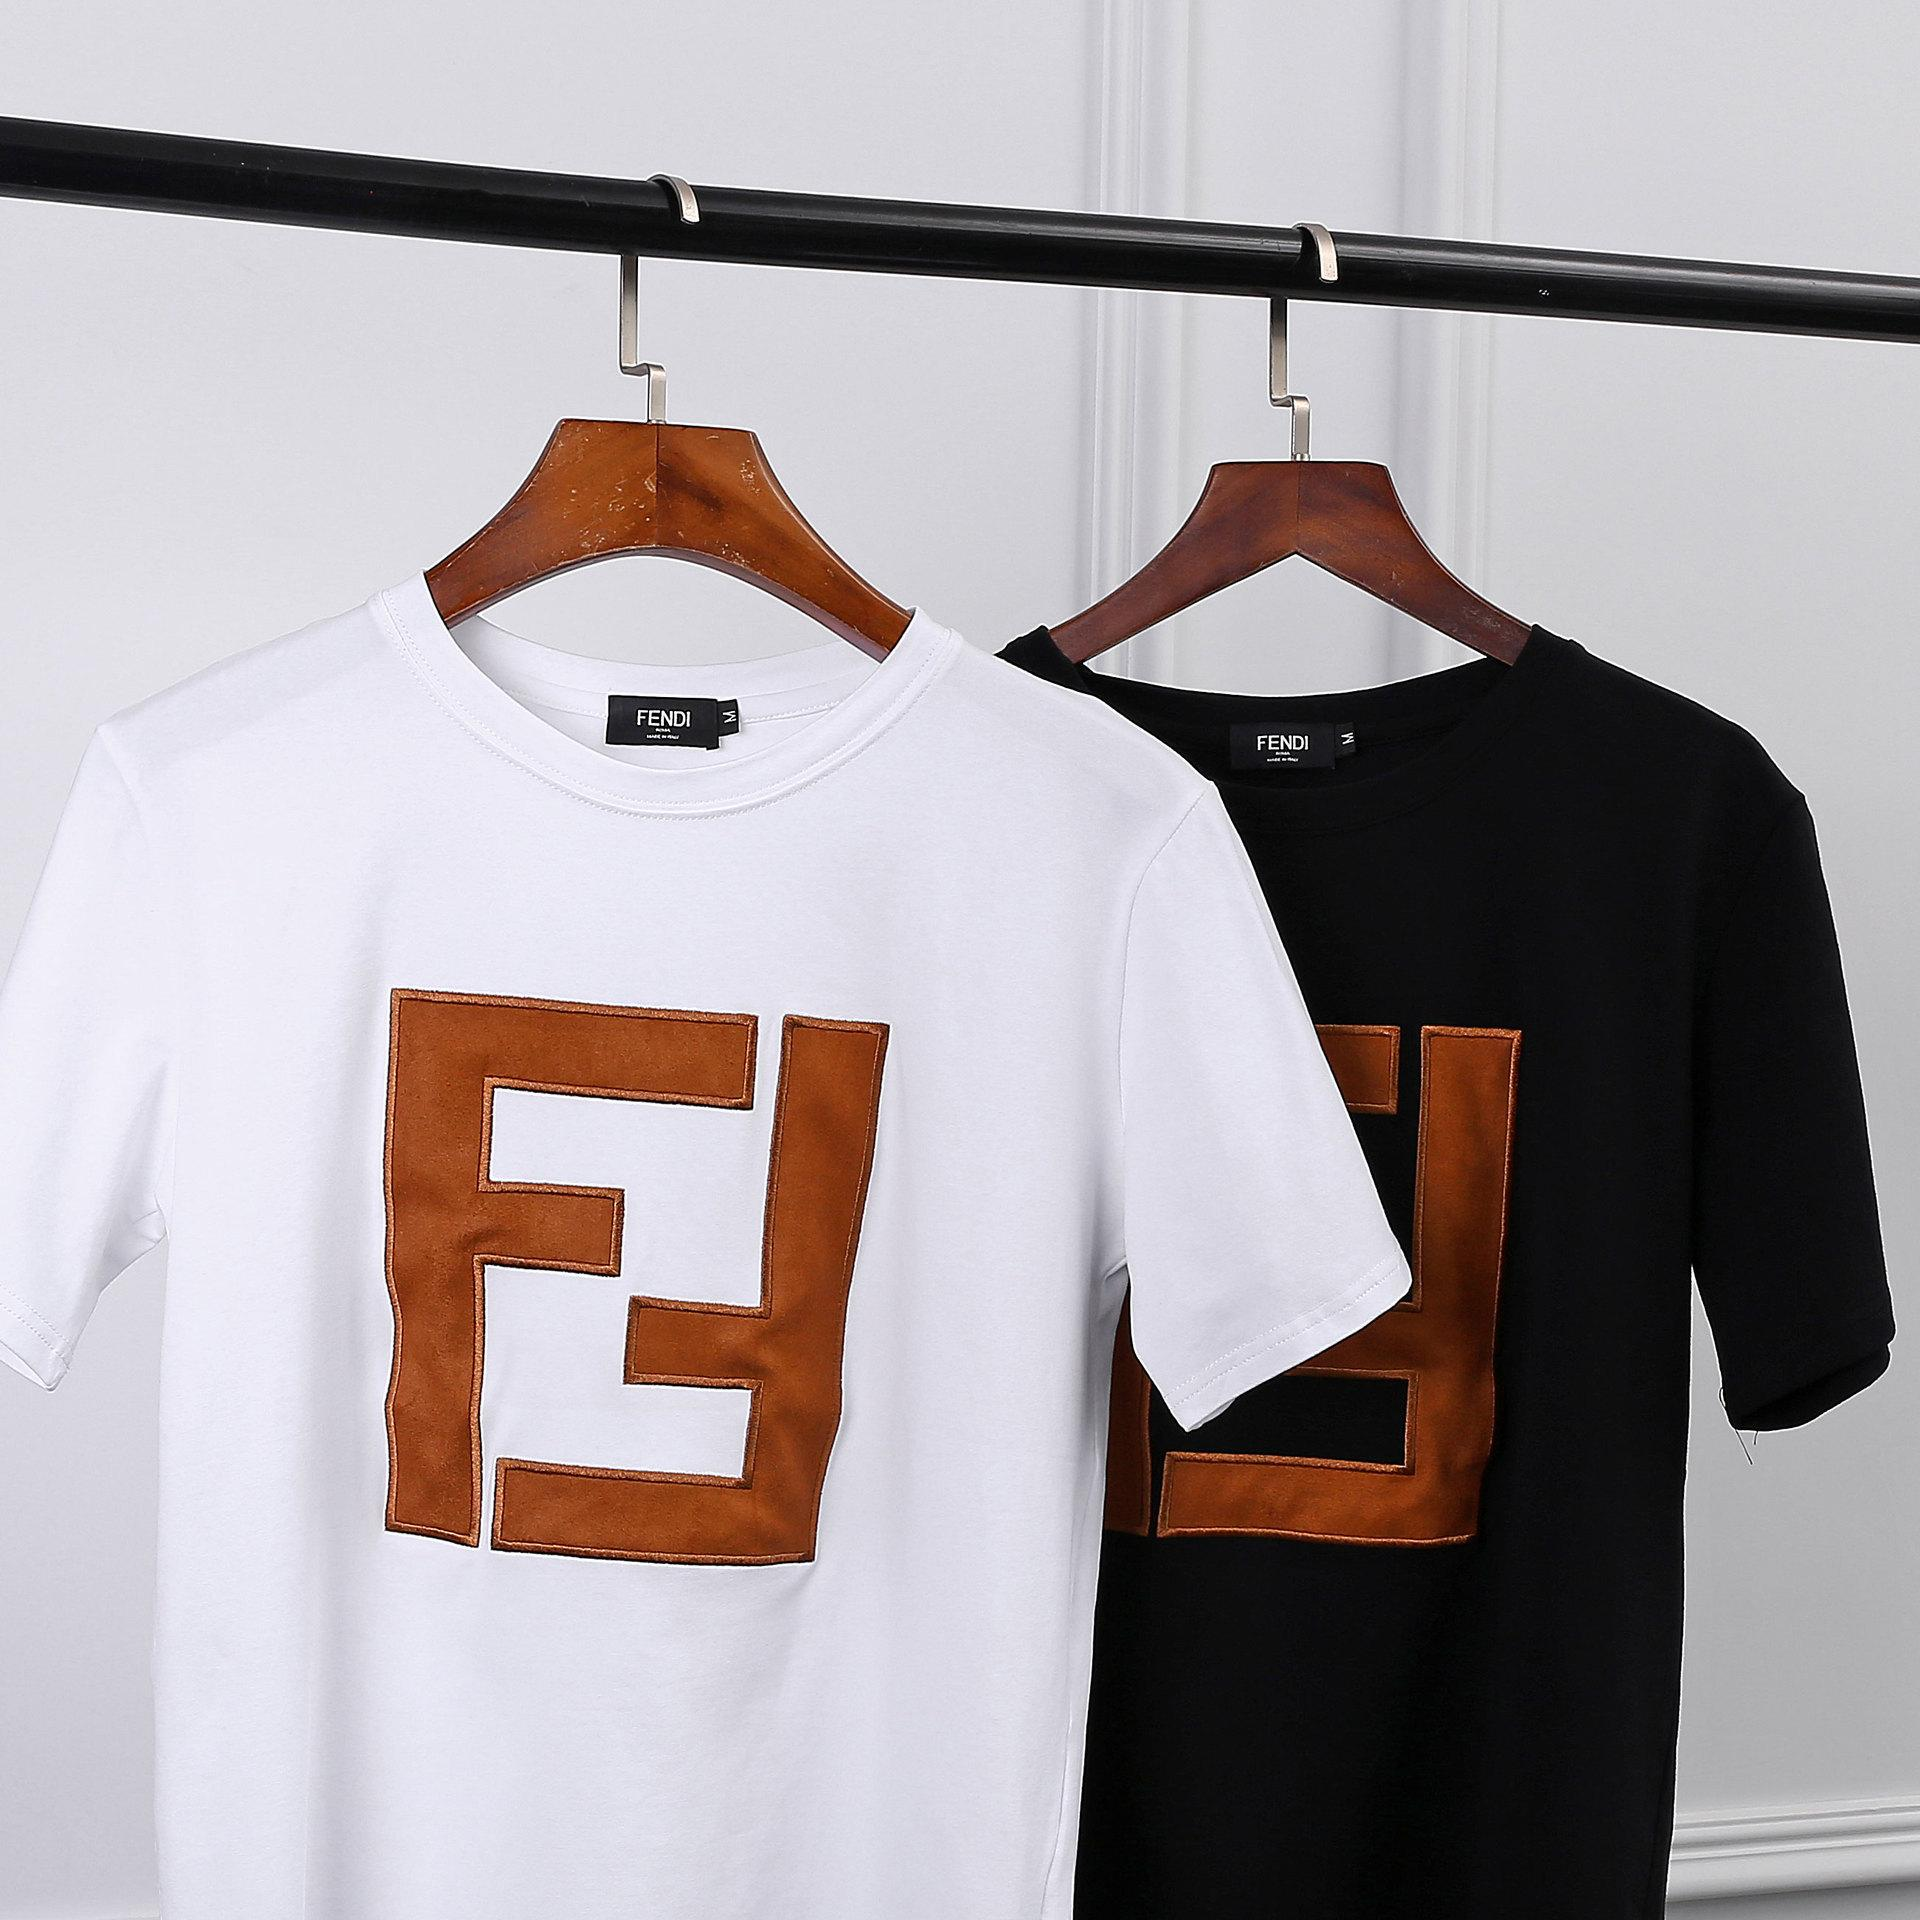 d91ea14f955b 18ss FEND Men s Designer Shirt FF Letter Men s Summer T Shirt Short ...